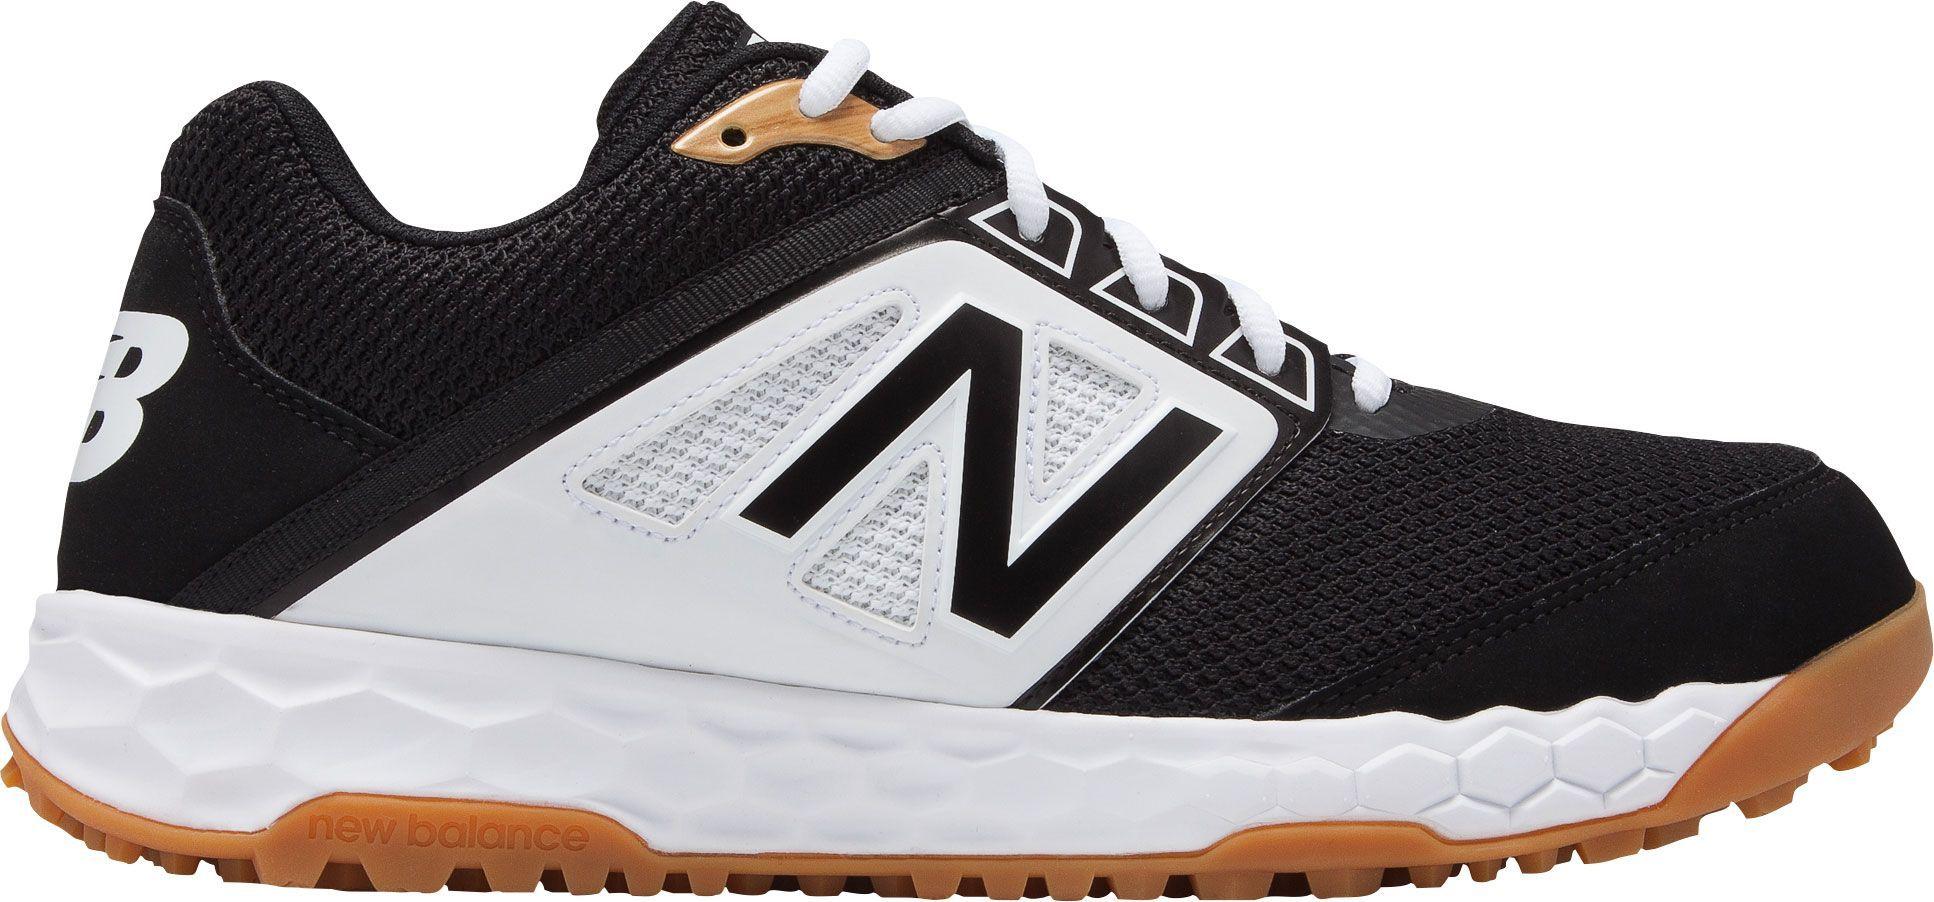 New Balance Men s 3000 V4 Turf Baseball Trainers d26a78e525c